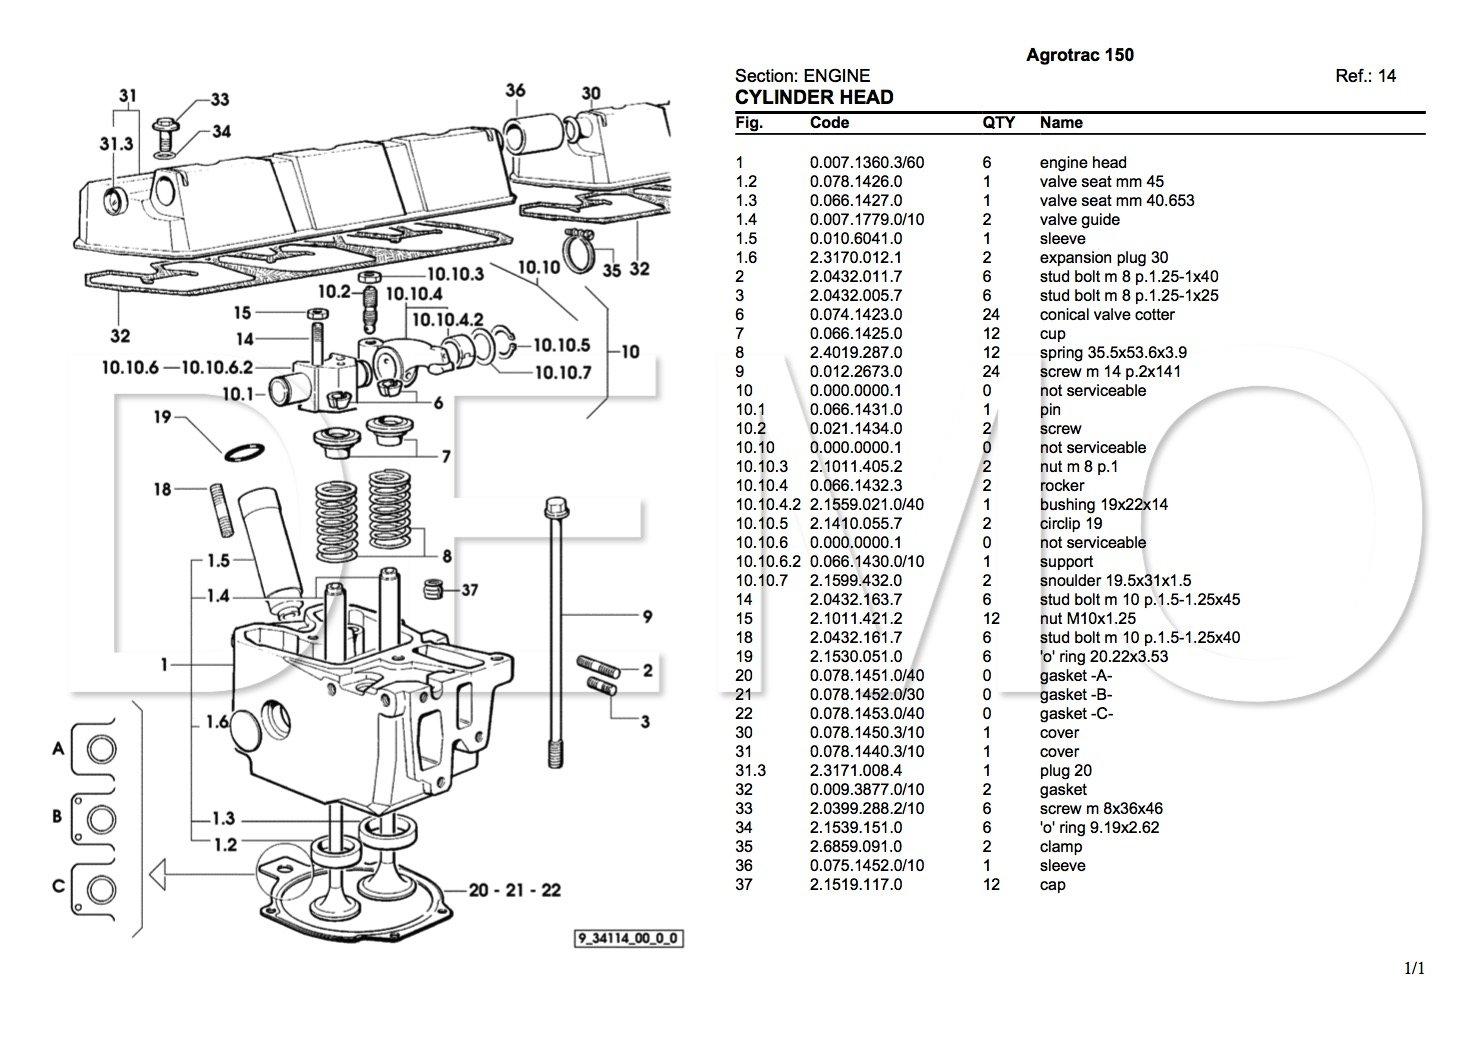 LM 40] Deutz Parts Diagram Wiring Diagram